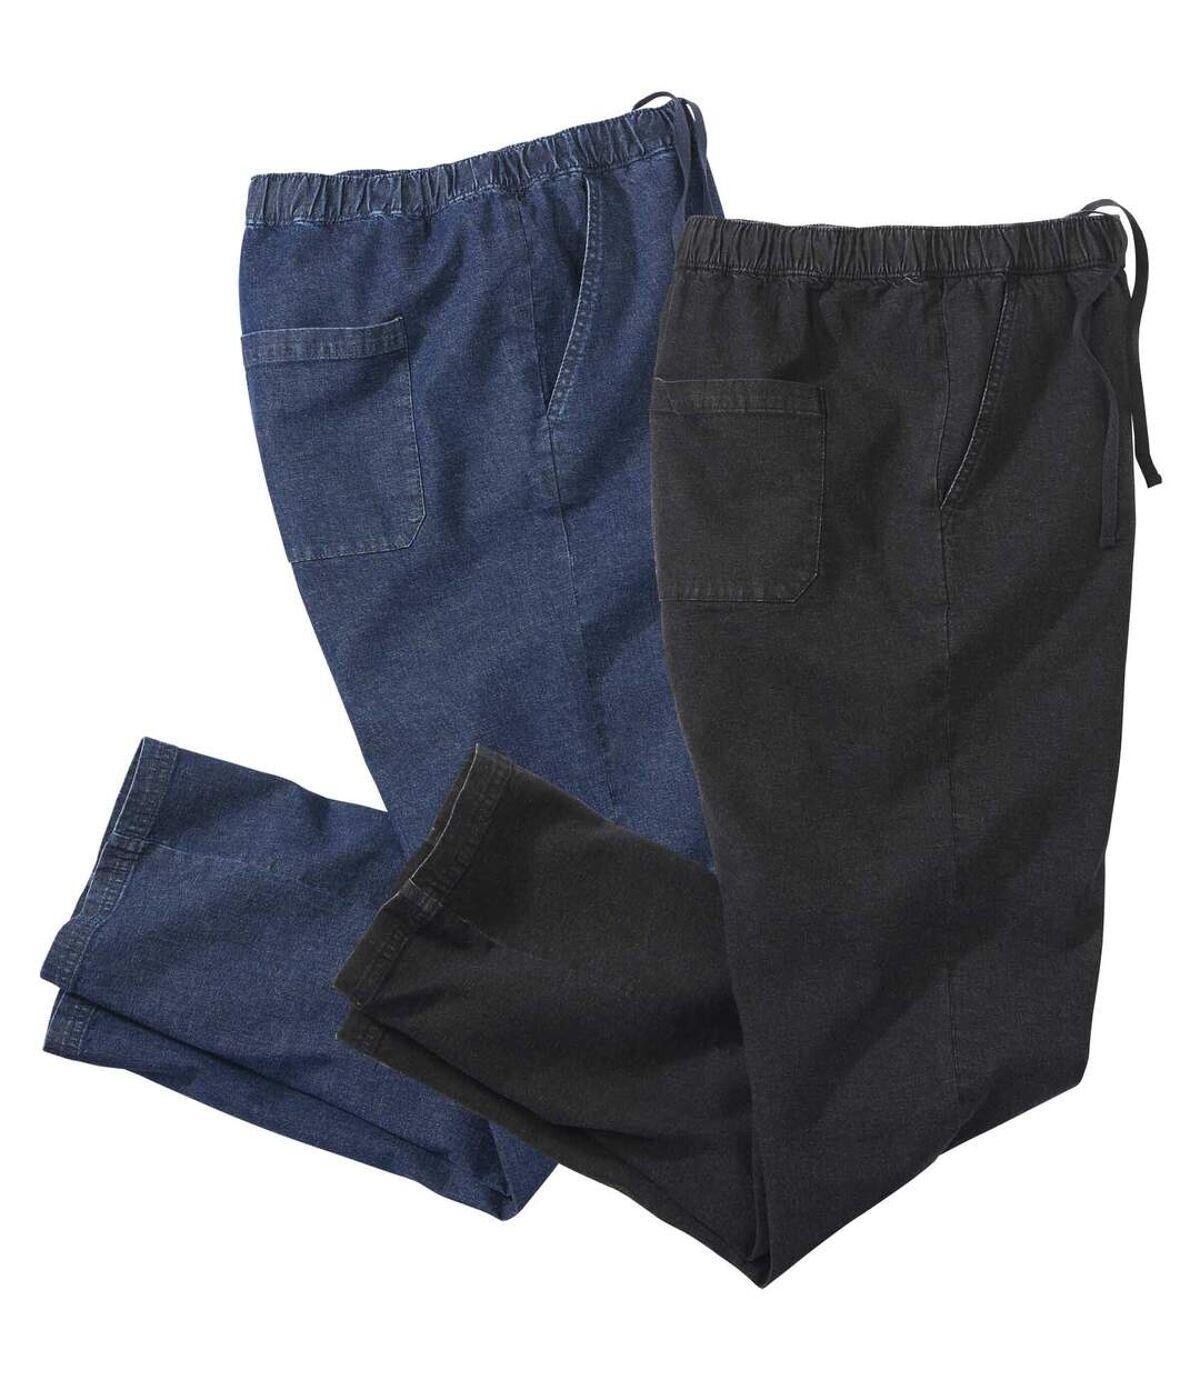 Pack of 2 Men's Casual Jeans - Black Blue Atlas For Men